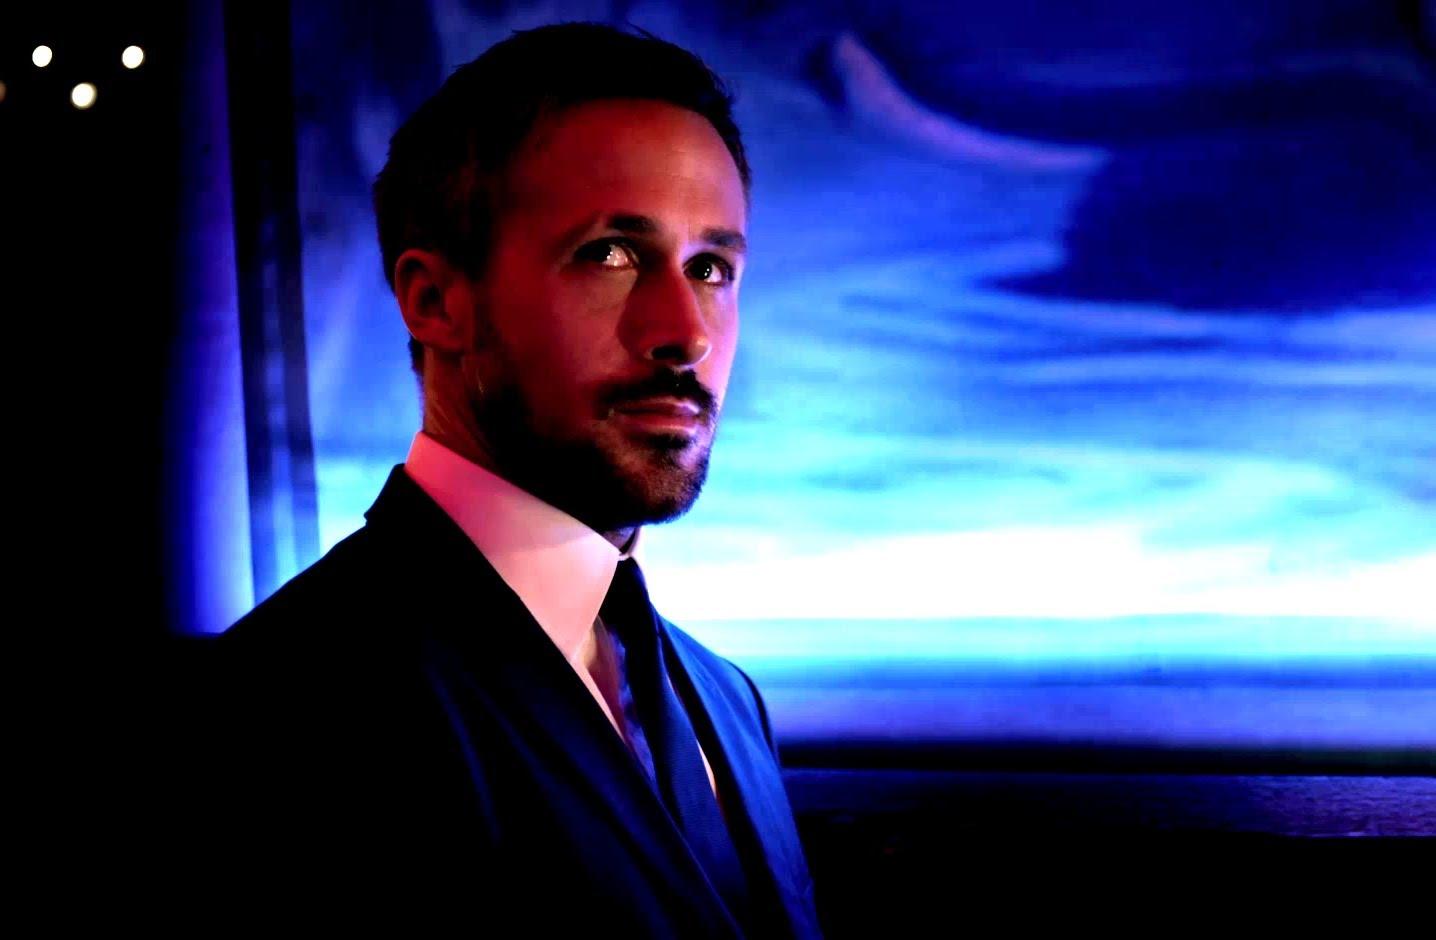 Ryan Gosling - Messy Movies